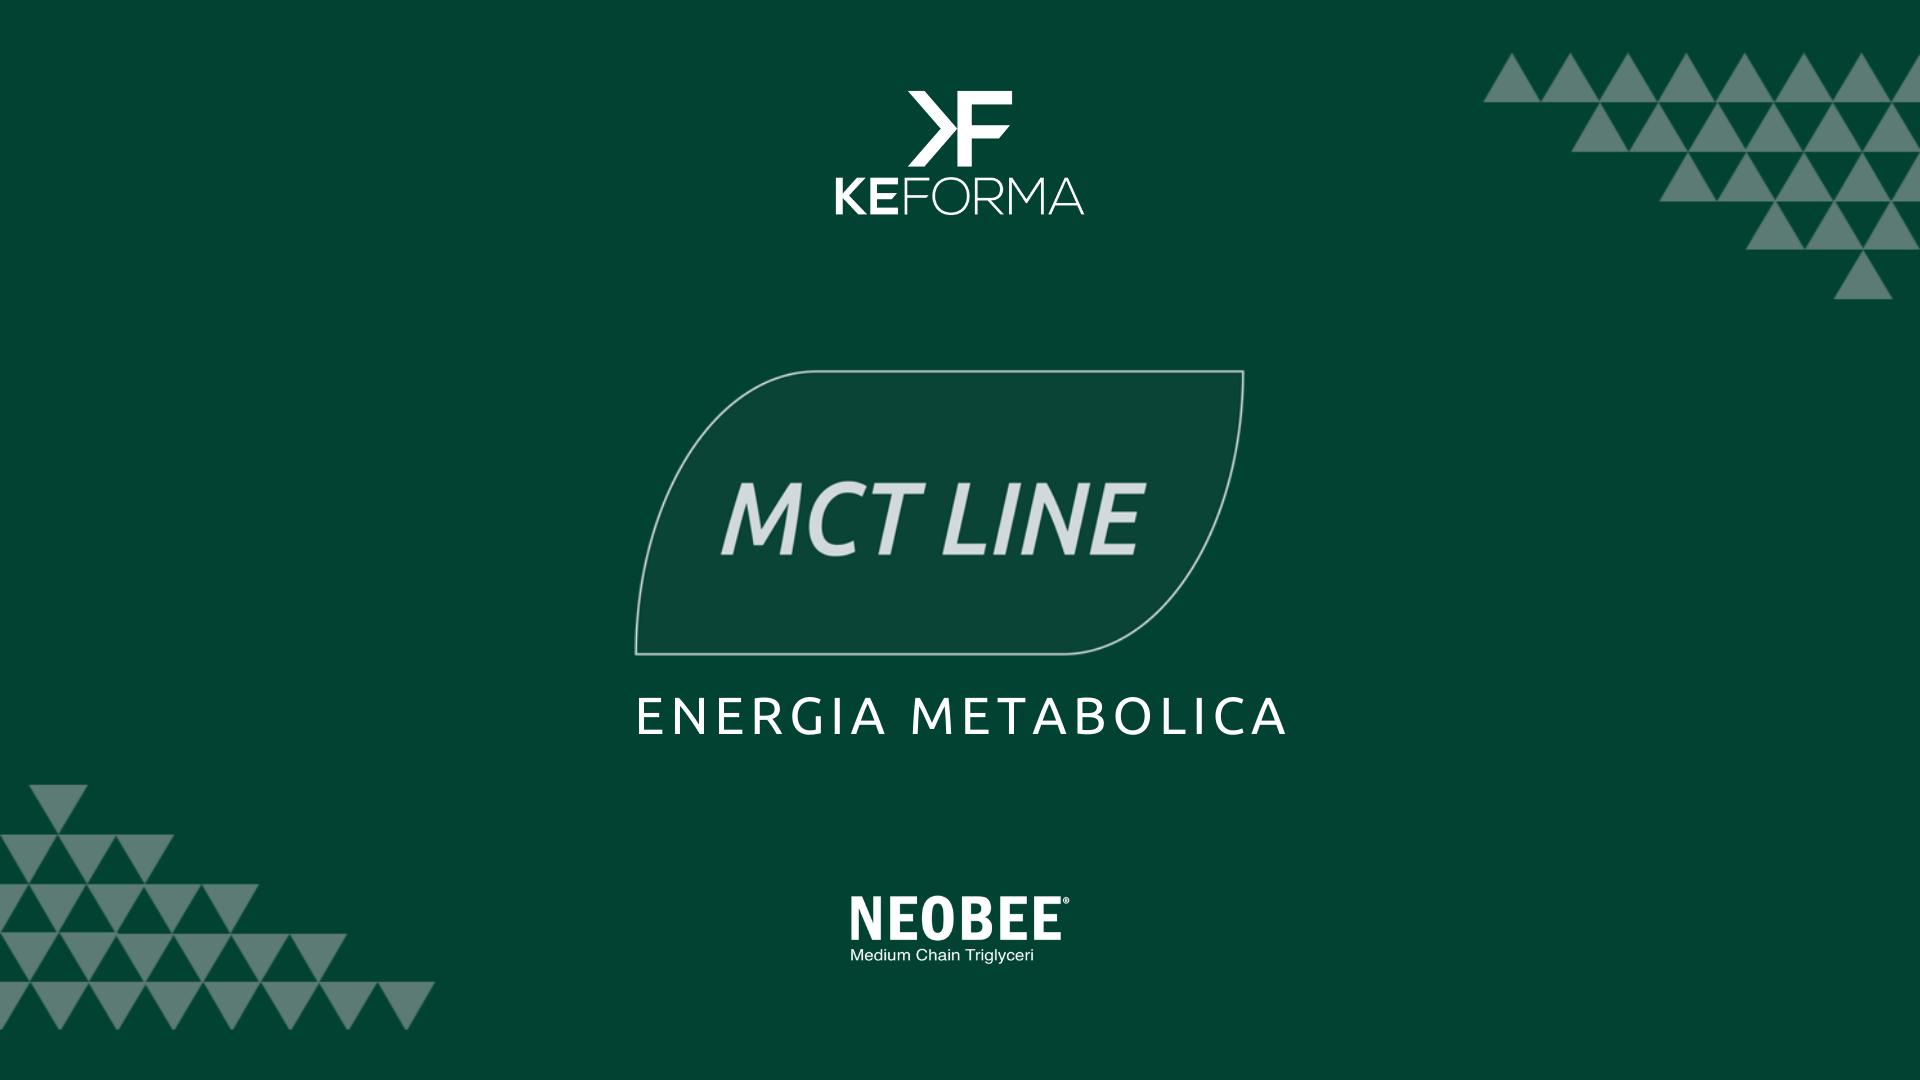 MCT LINE KEFORMA